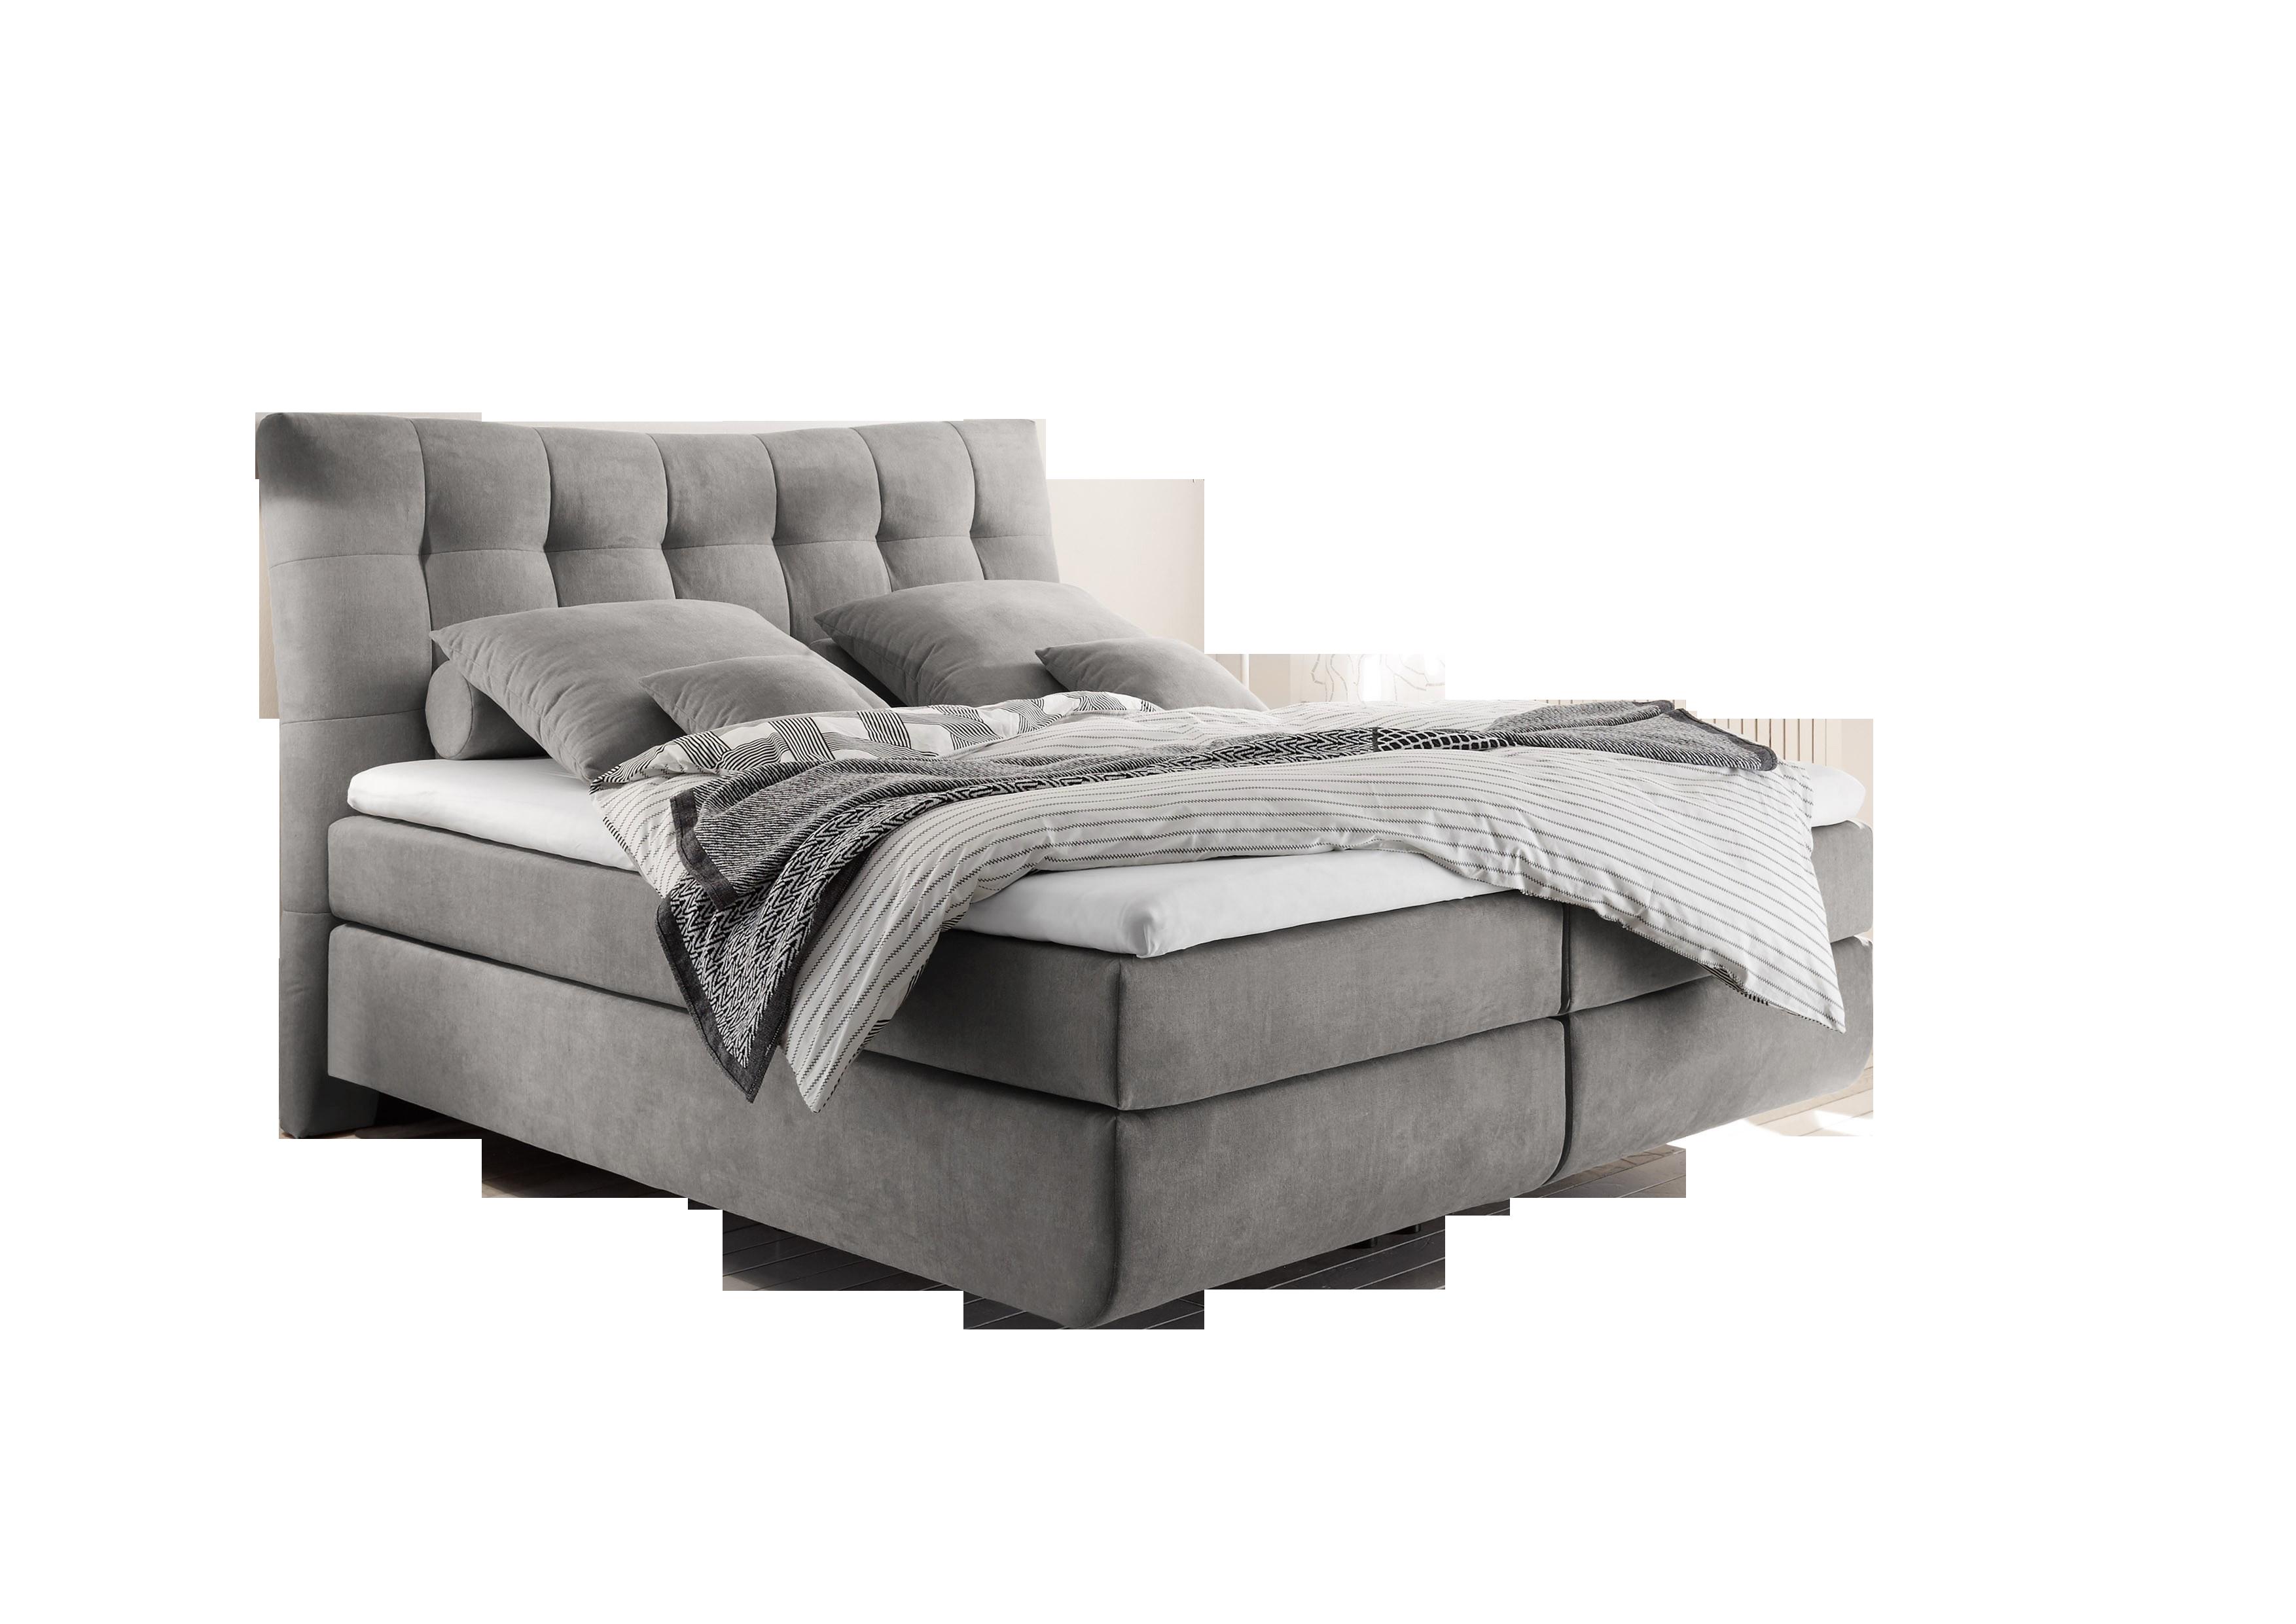 Boxspringbett Malibu grey 100% Polyester